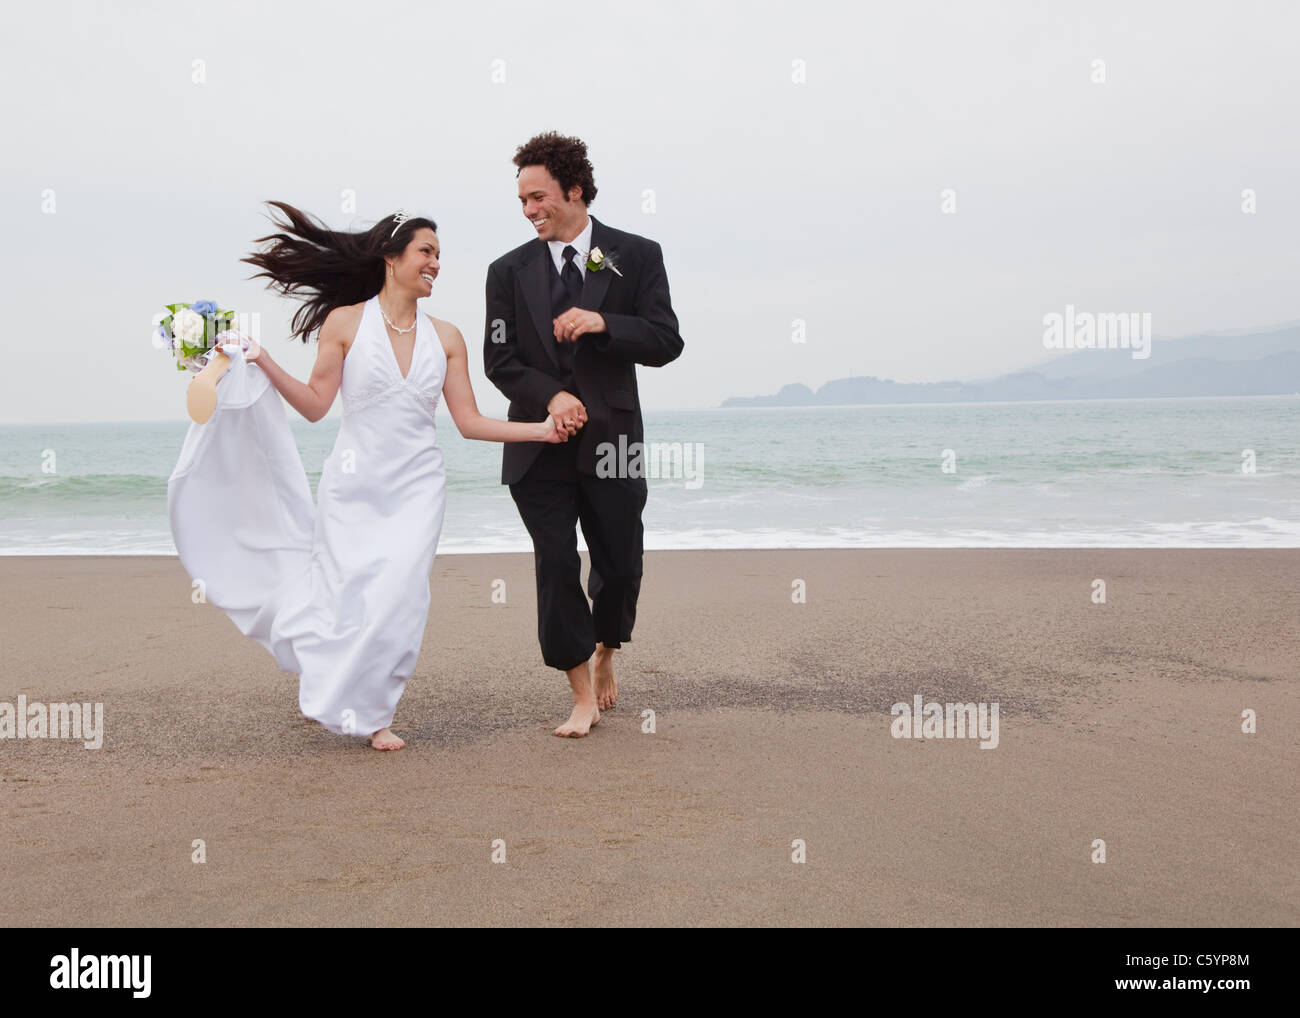 USA, California, San Francisco, Baker Beach, bride and groom walking on beach - Stock Image